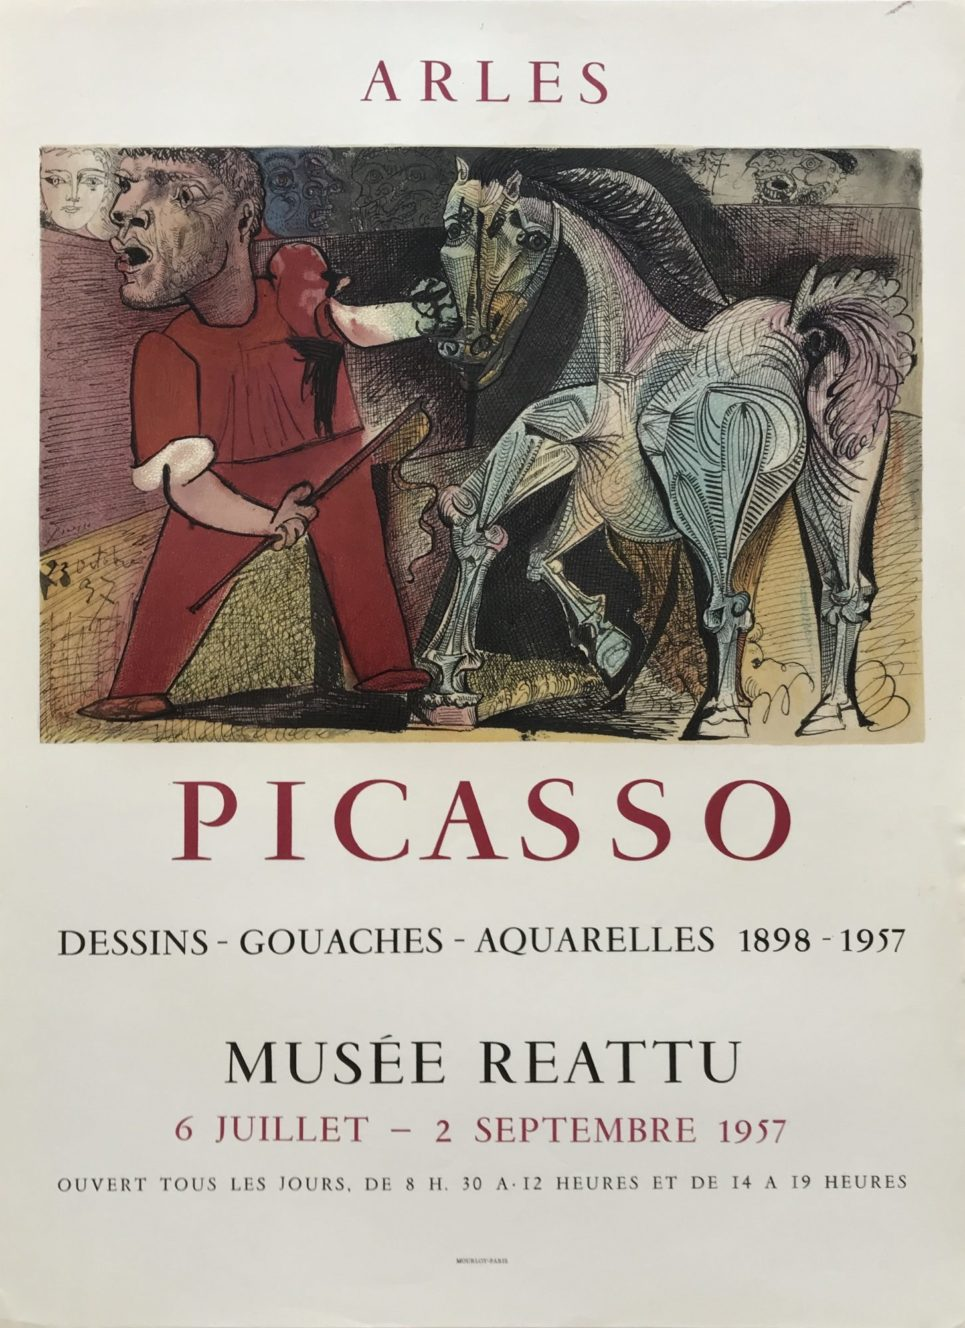 Pablo Picasso - Dessins-Gouaches-Aquarelles 1898-1957